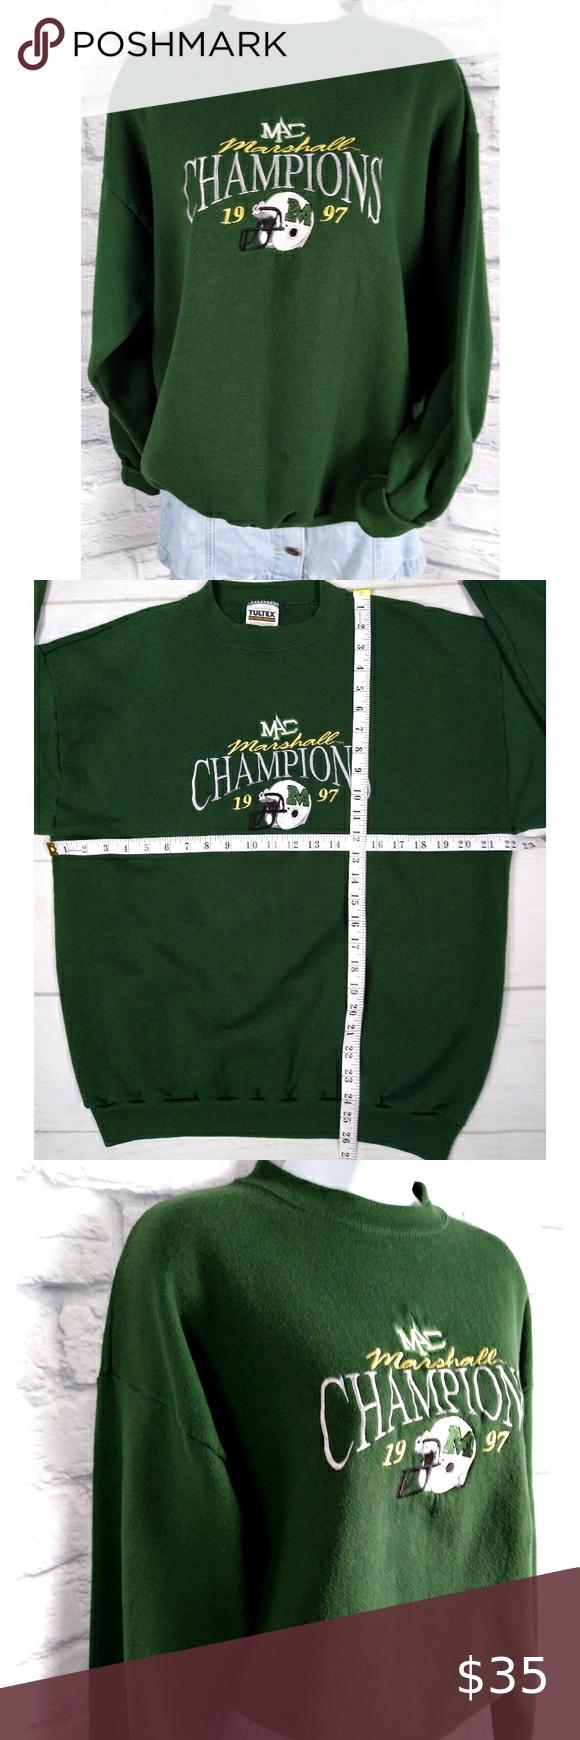 Vtg 1997 Tultex Marshall University Sweatshirt Vintage Sweatshirt Clothes Design Cute Sweatshirts [ 1740 x 580 Pixel ]